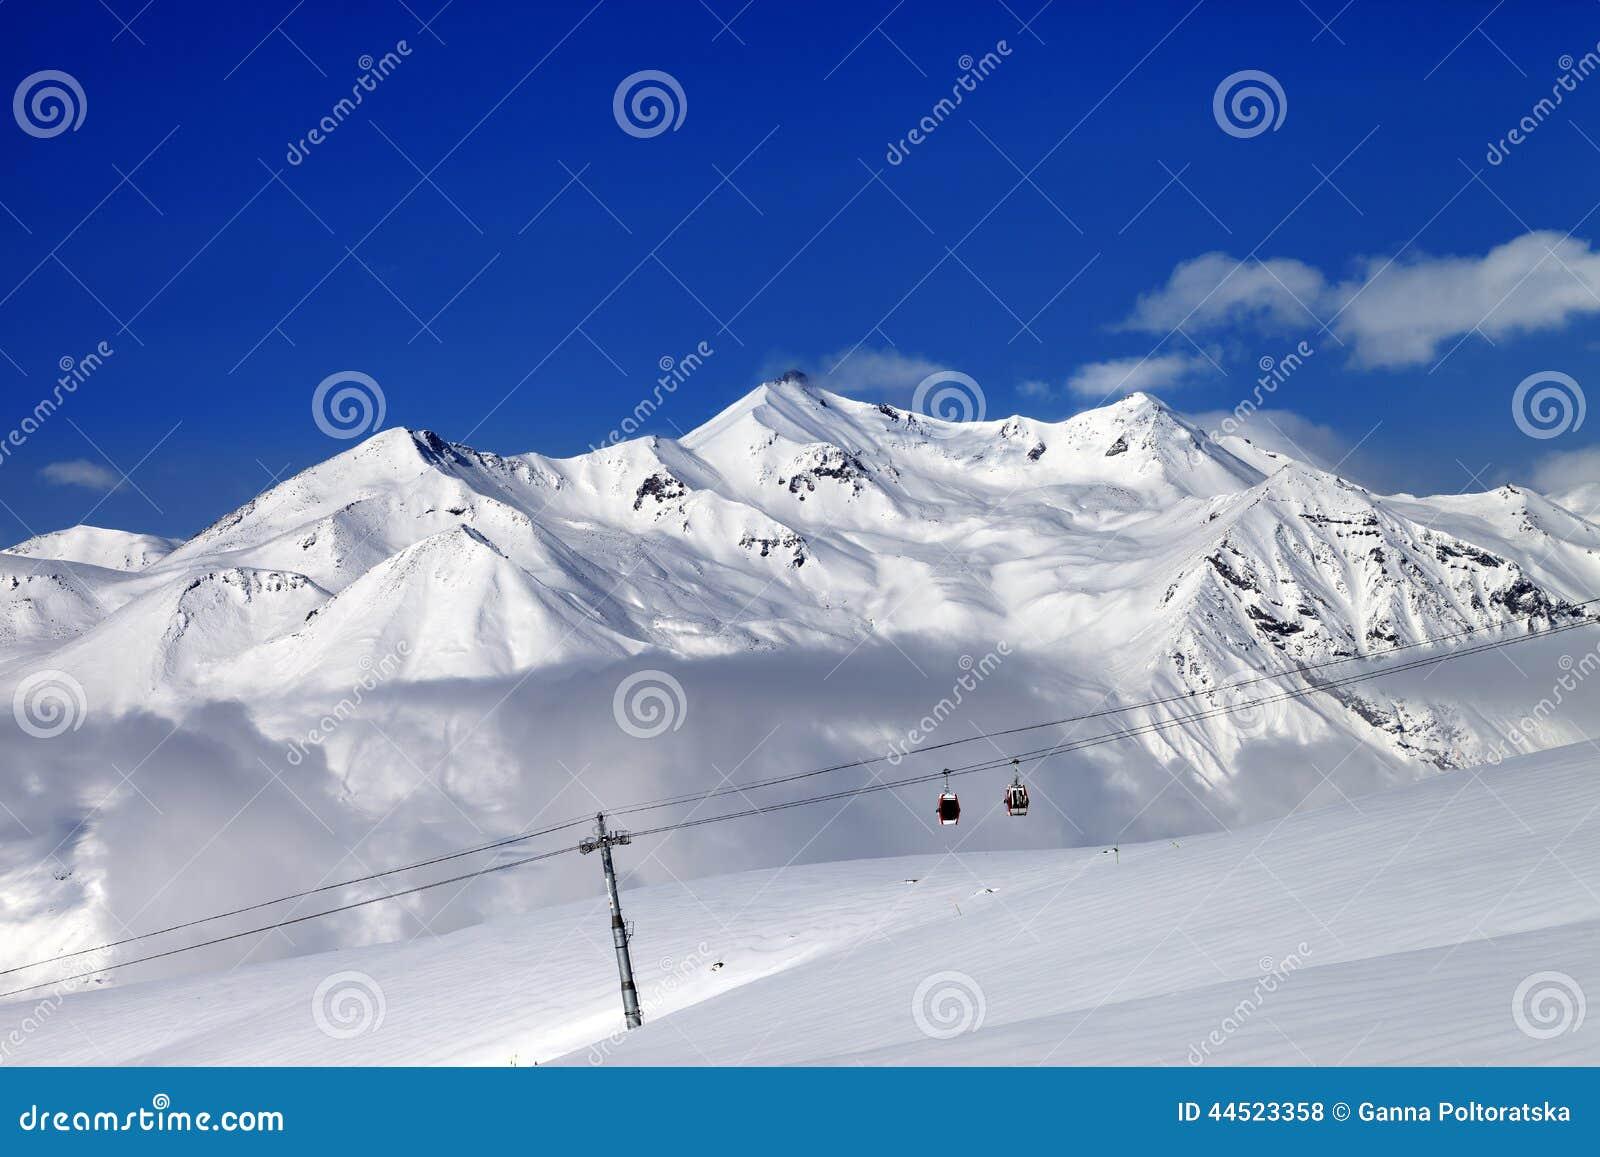 ski resort at nice sun day stock photo. image of blue - 44523358